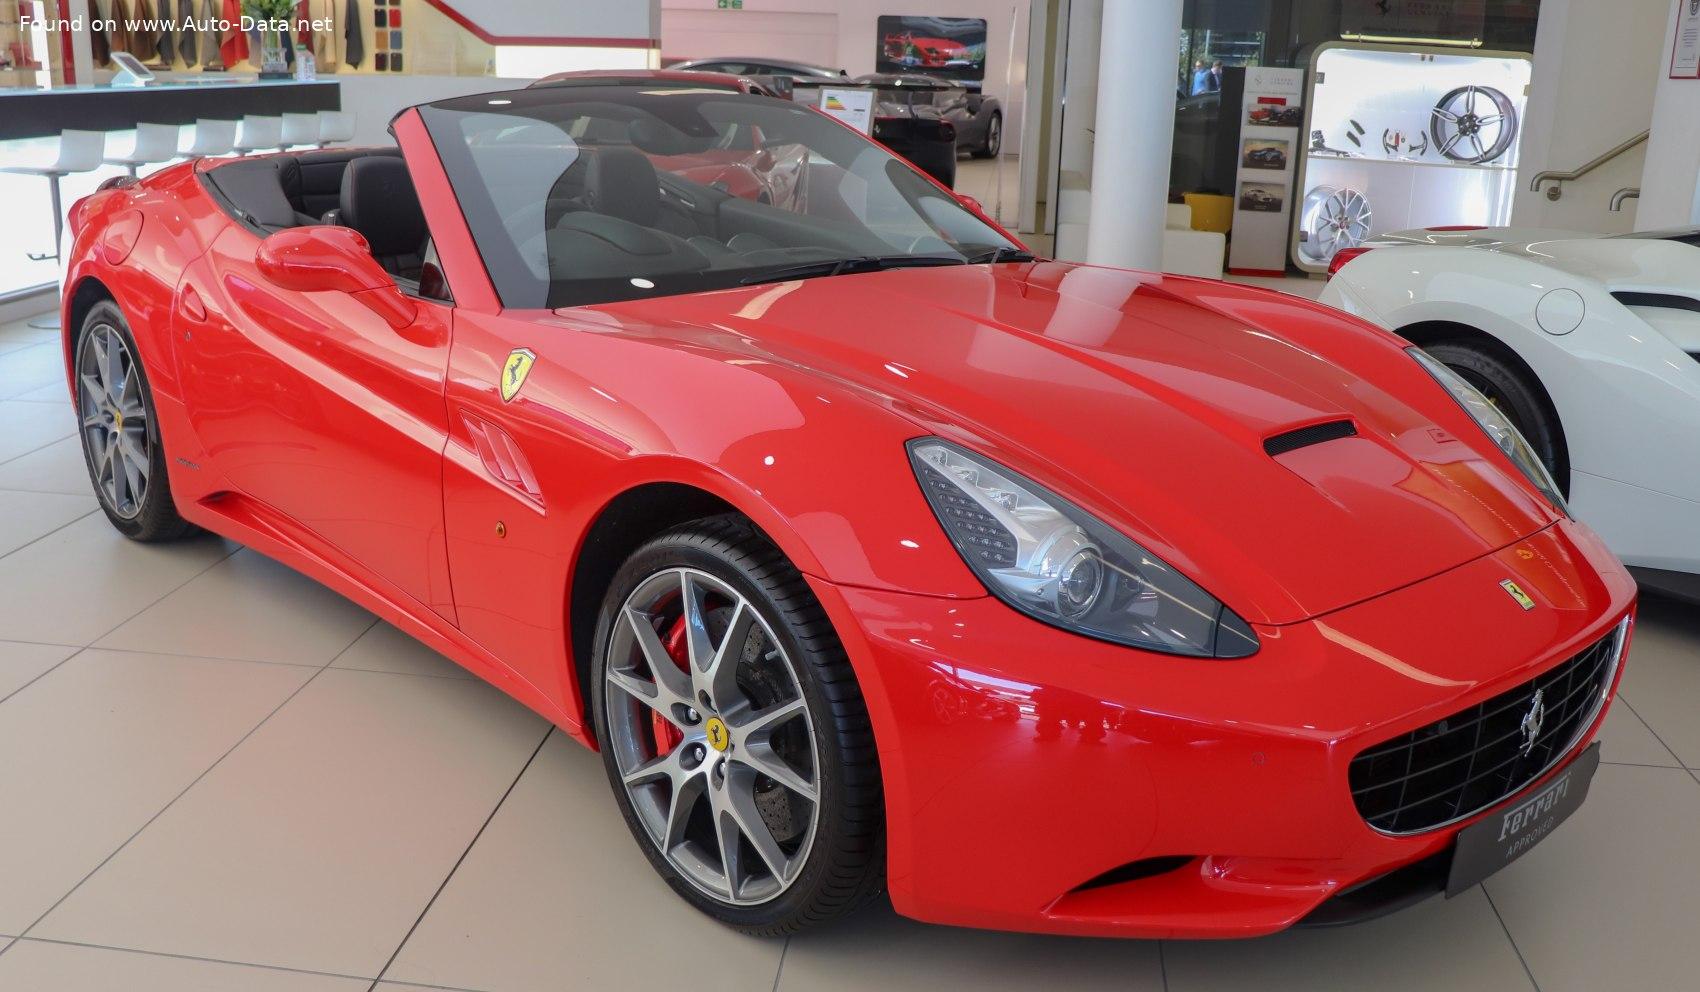 2012 Ferrari California 4 3 V8 490 Ps Technische Daten Verbrauch Spezifikationen Maße